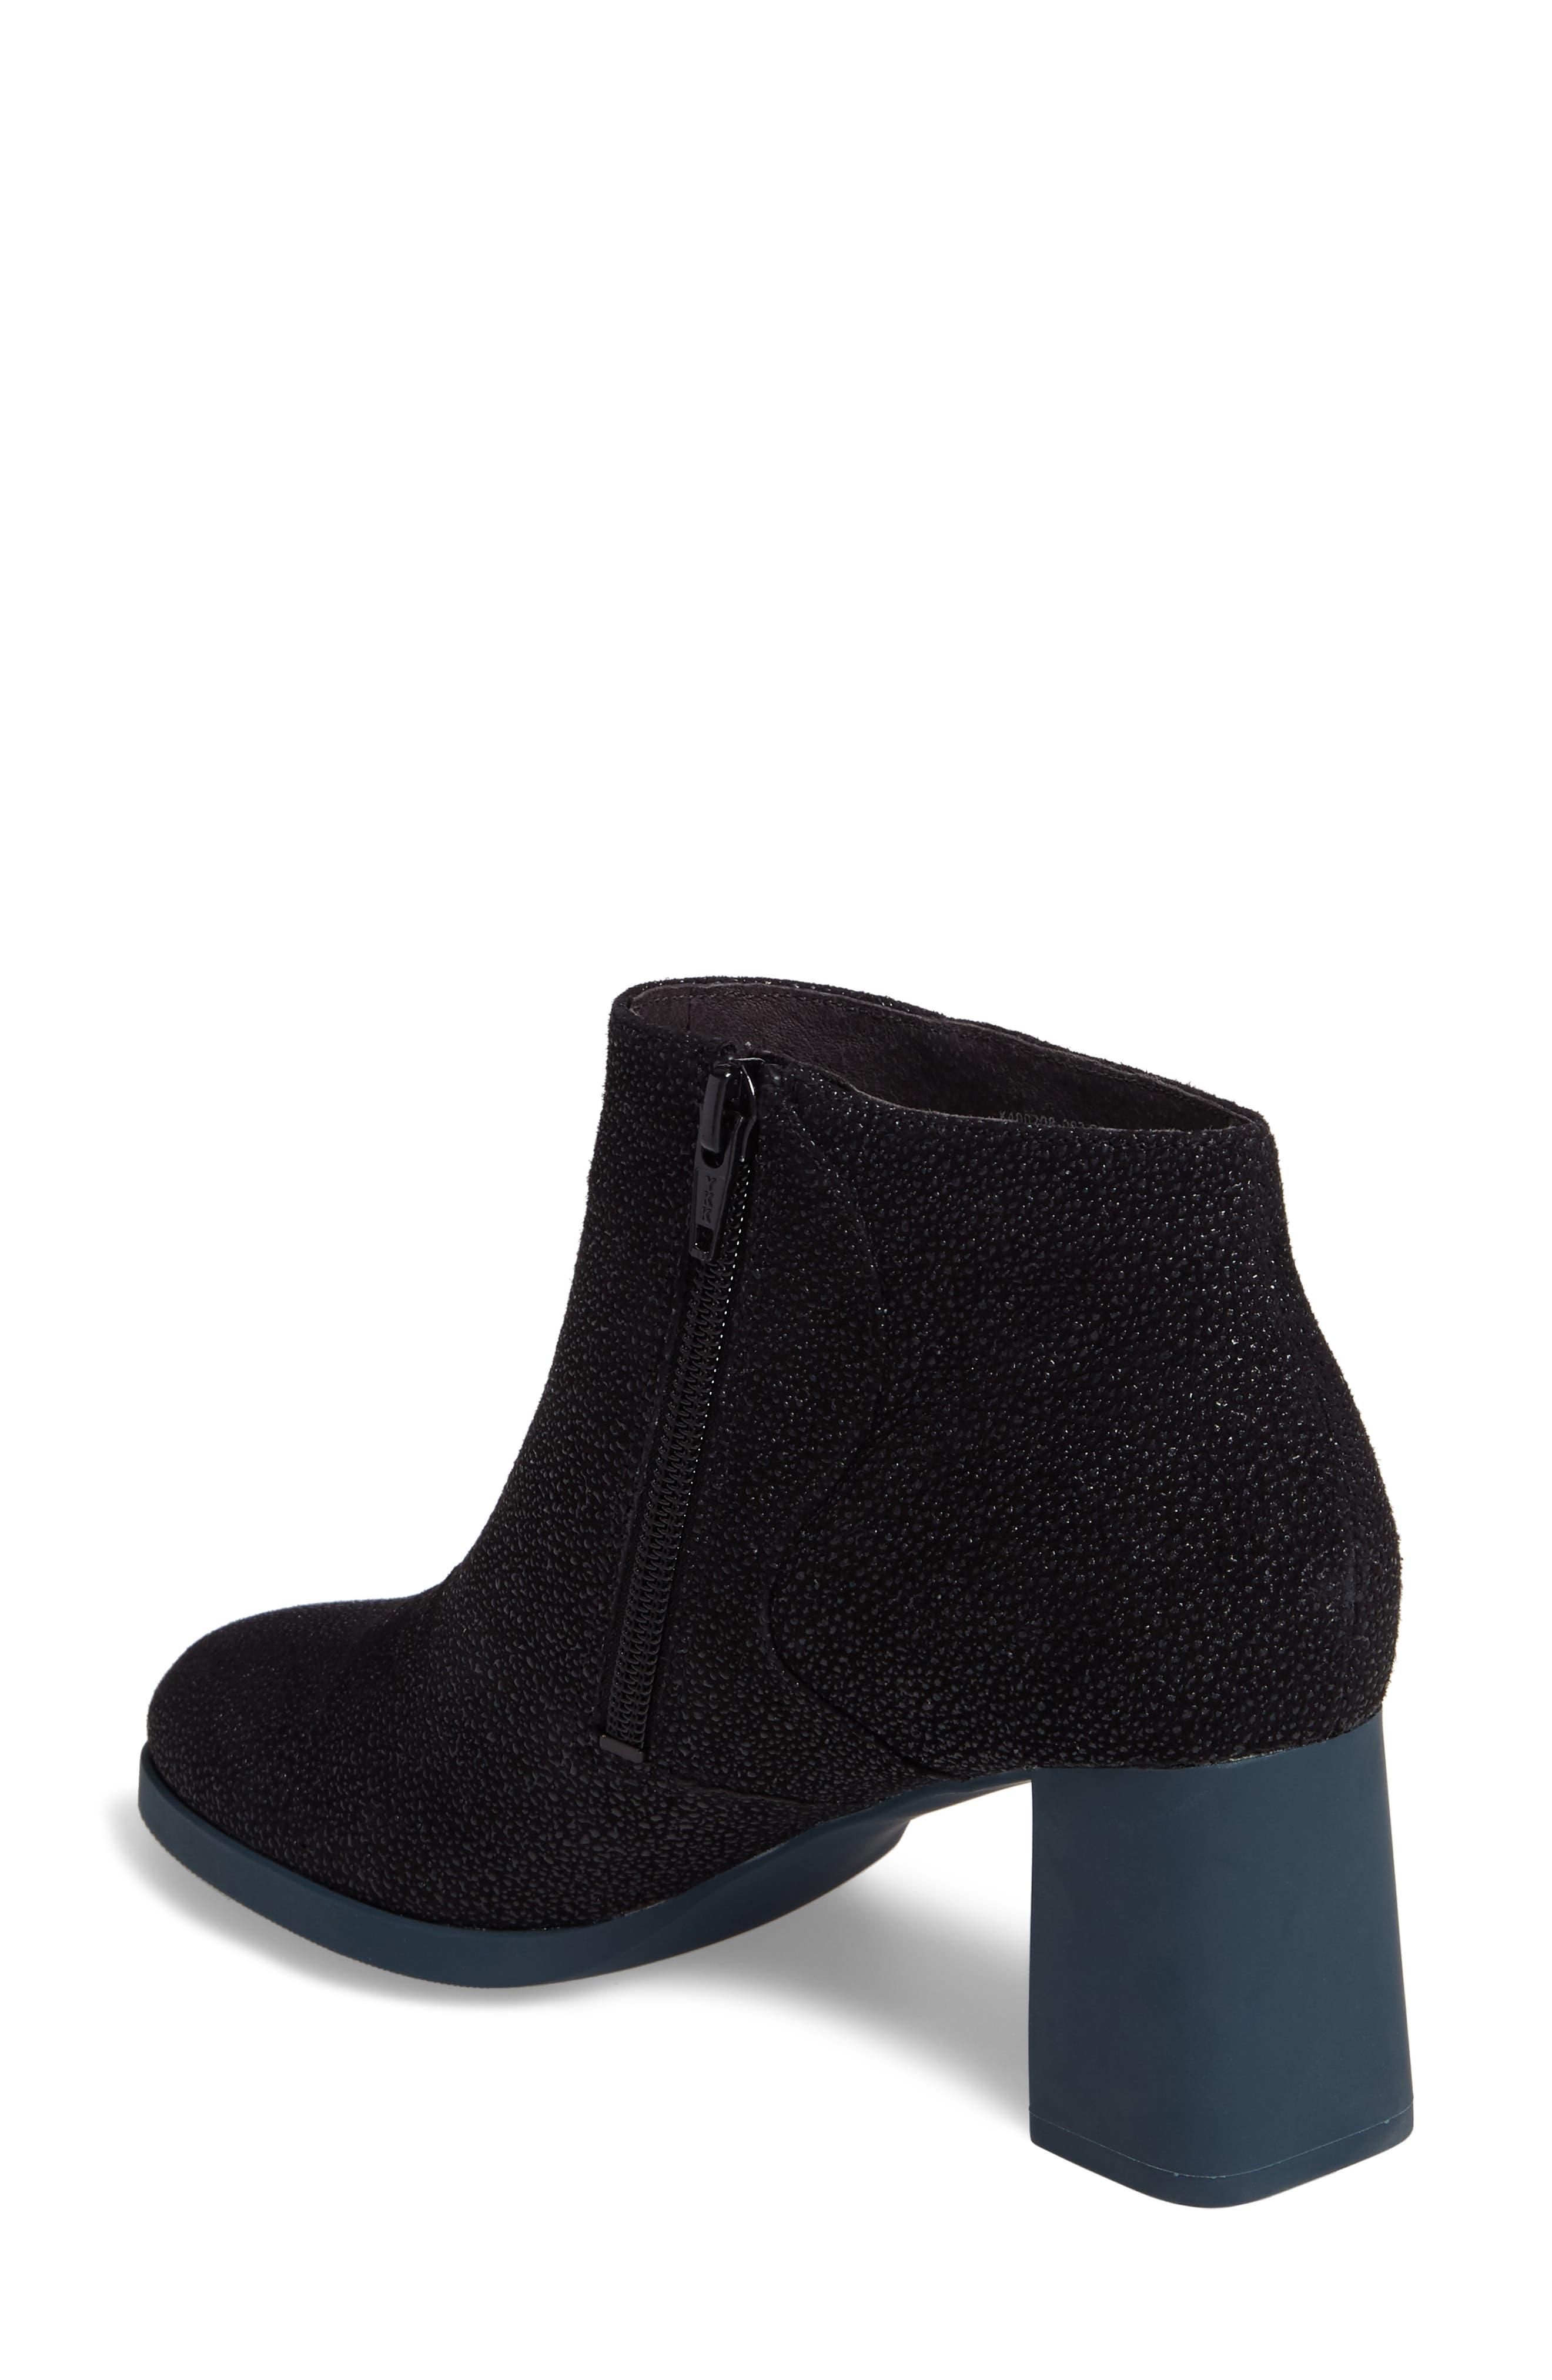 Kara Flared Heel Bootie,                             Alternate thumbnail 2, color,                             Black Sparkle Leather